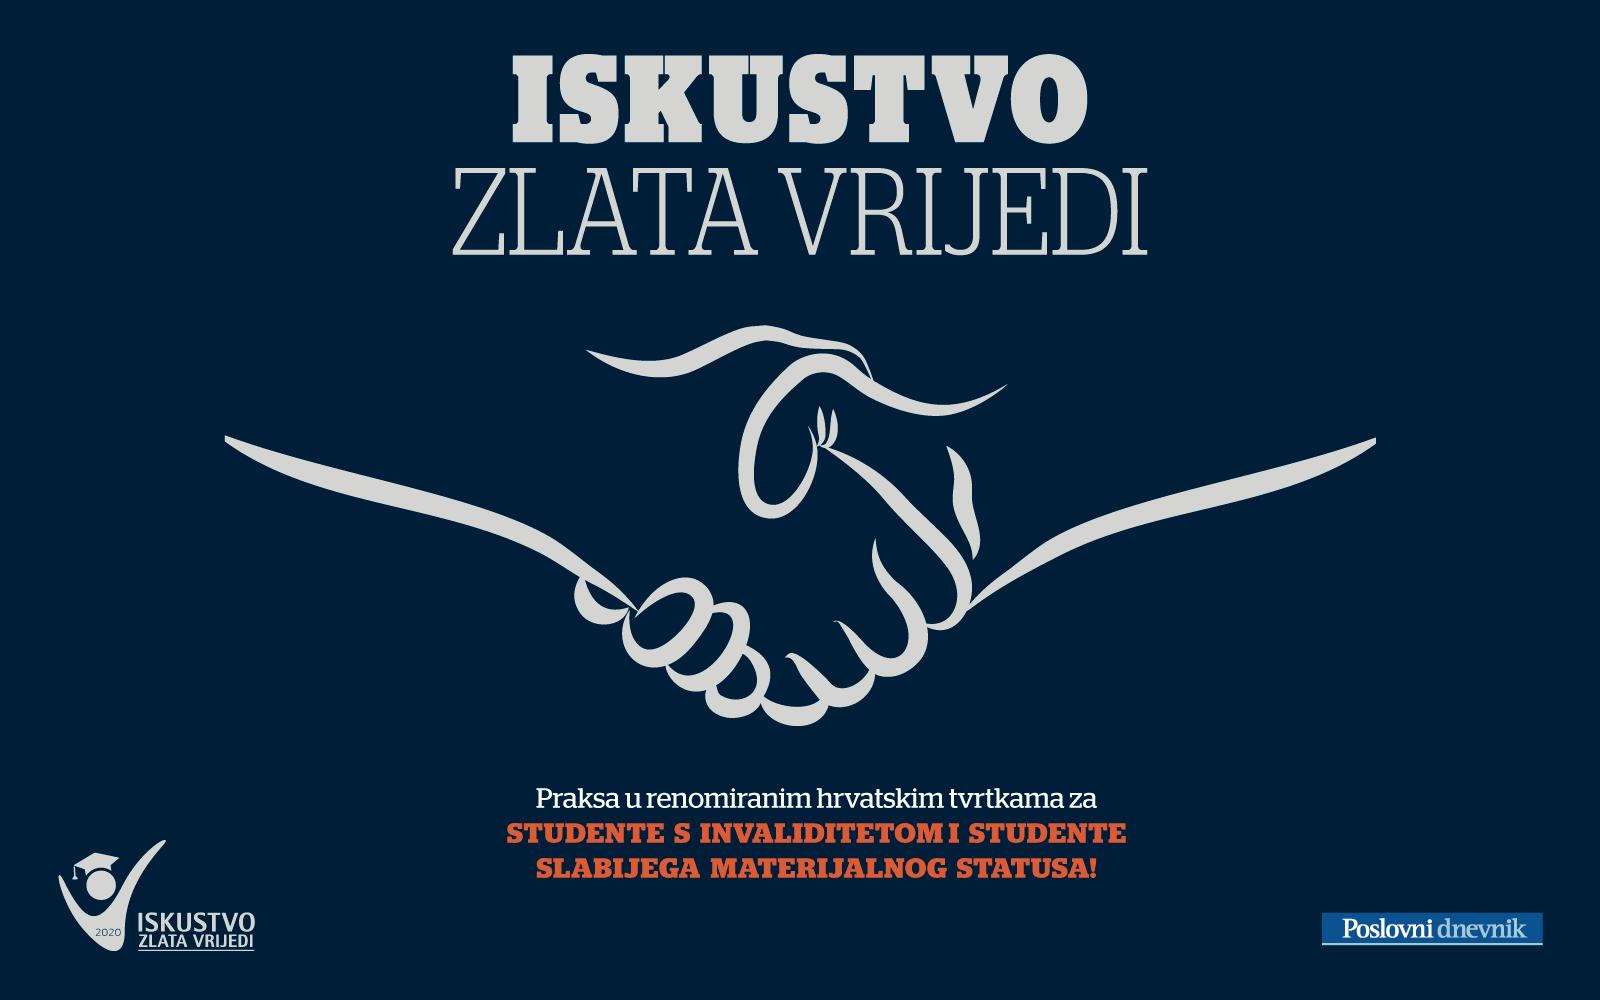 https://www.poslovni.hr/wp-content/uploads/2020/02/slika-za-pd-clanak.png